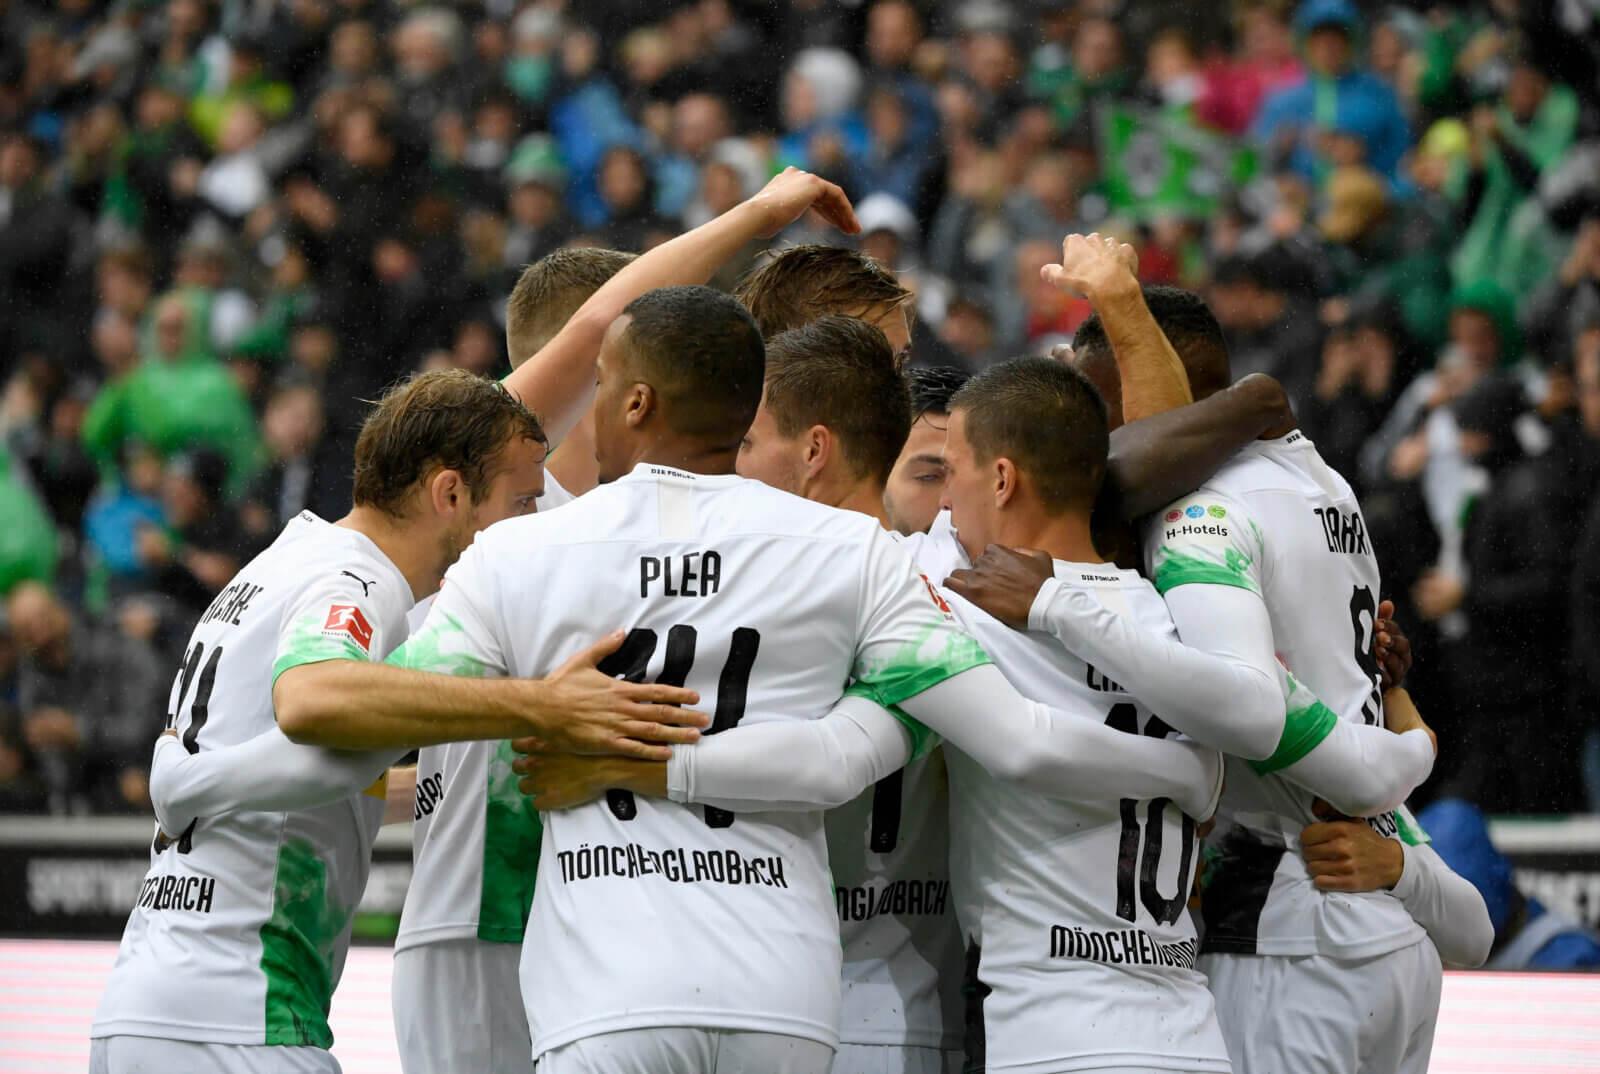 Borussia Mönchengladbach celebrate